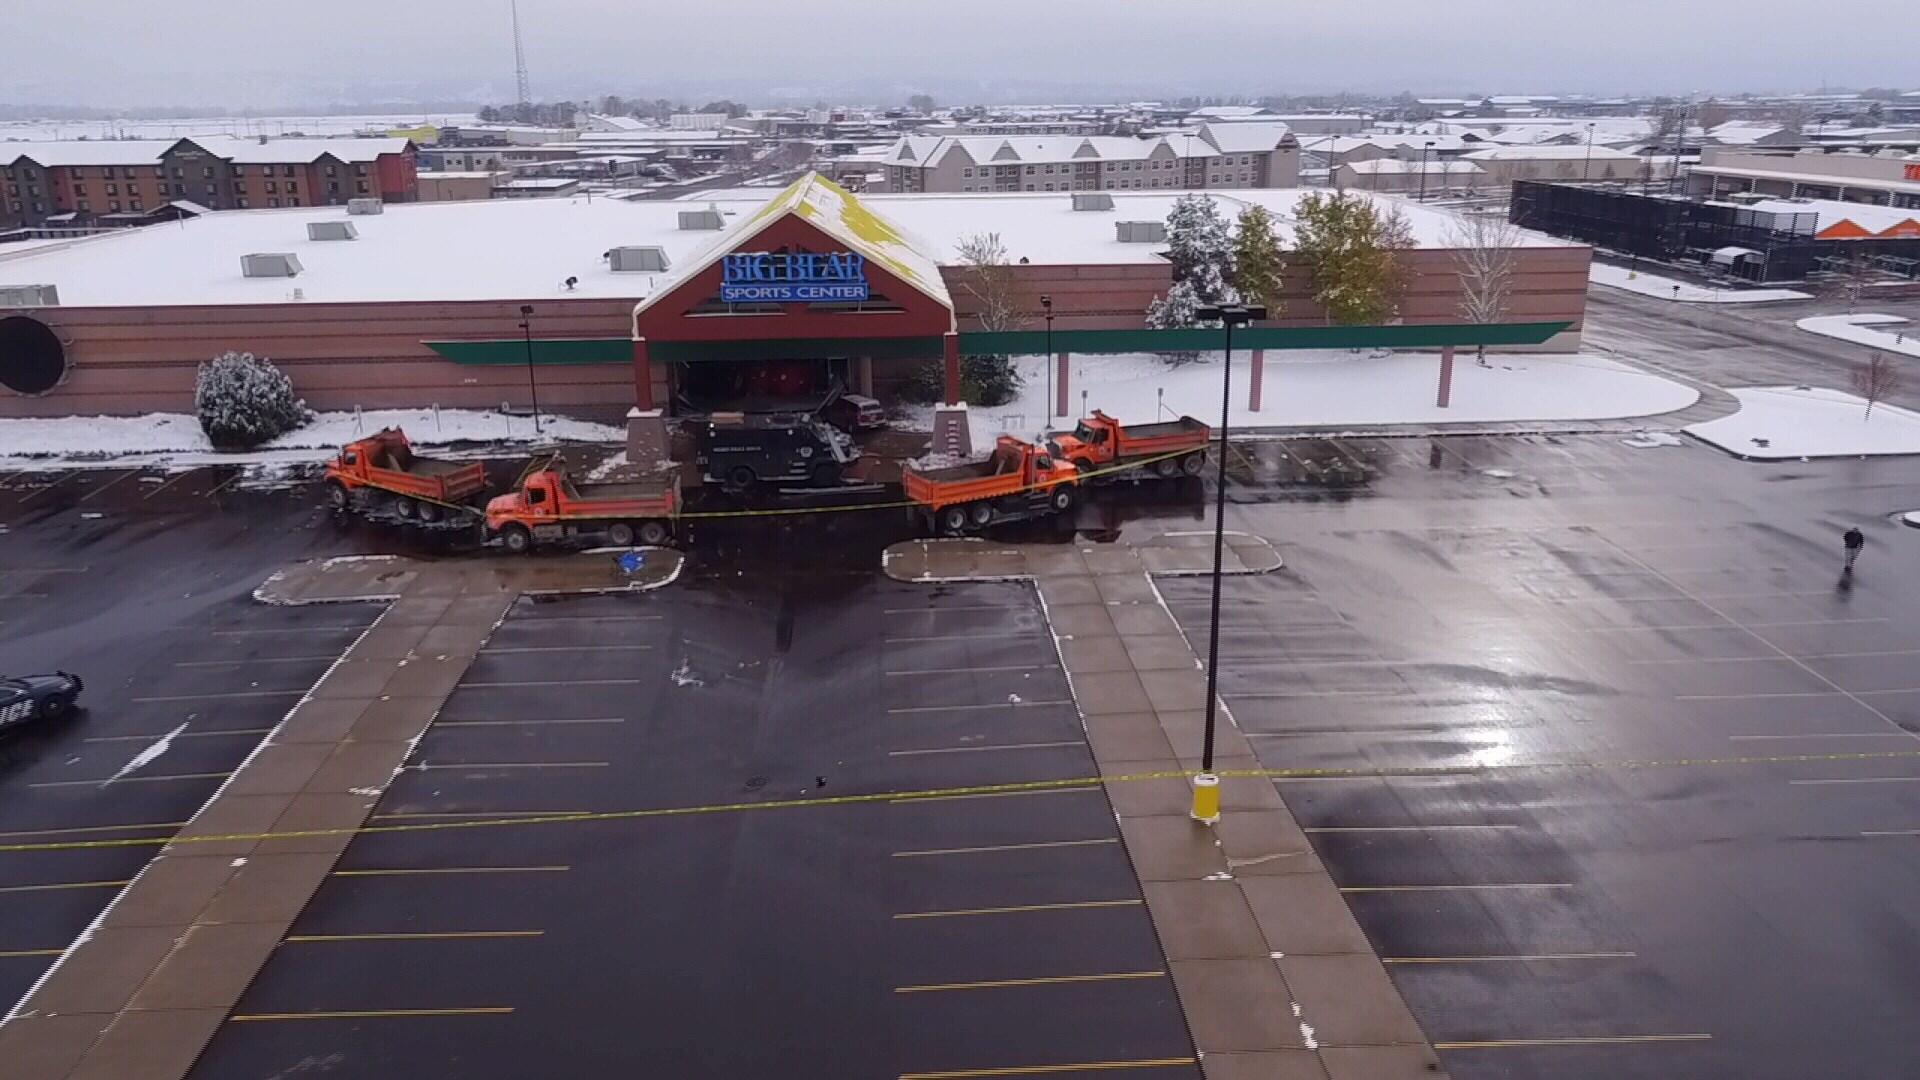 Big Bear Sports Center was damaged after Saturday standoff (MTN News)